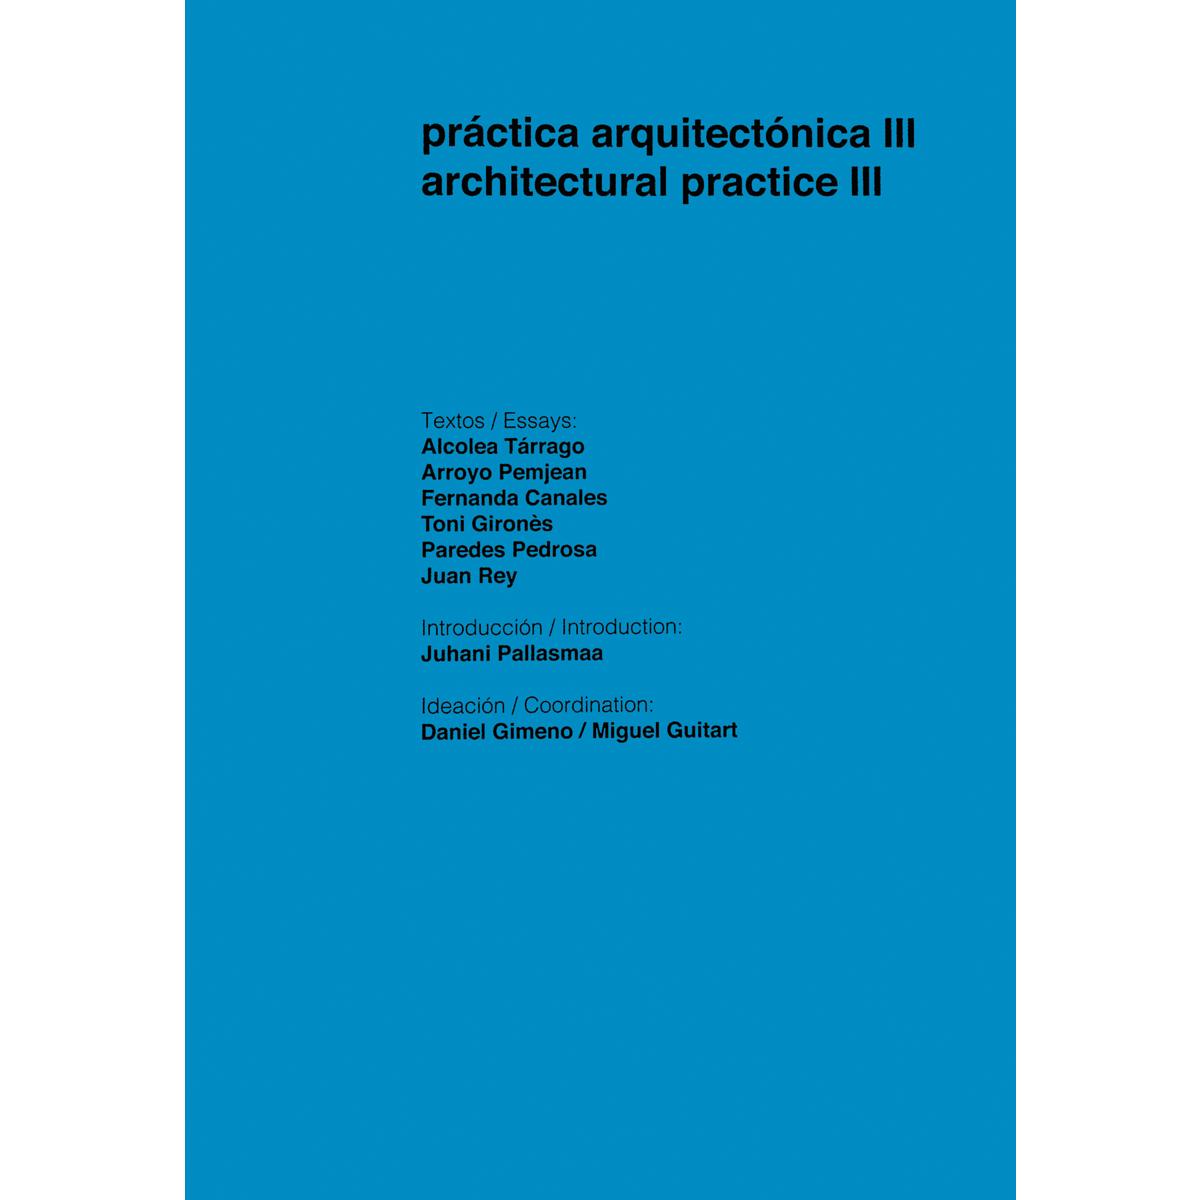 Práctica arquitectónica III